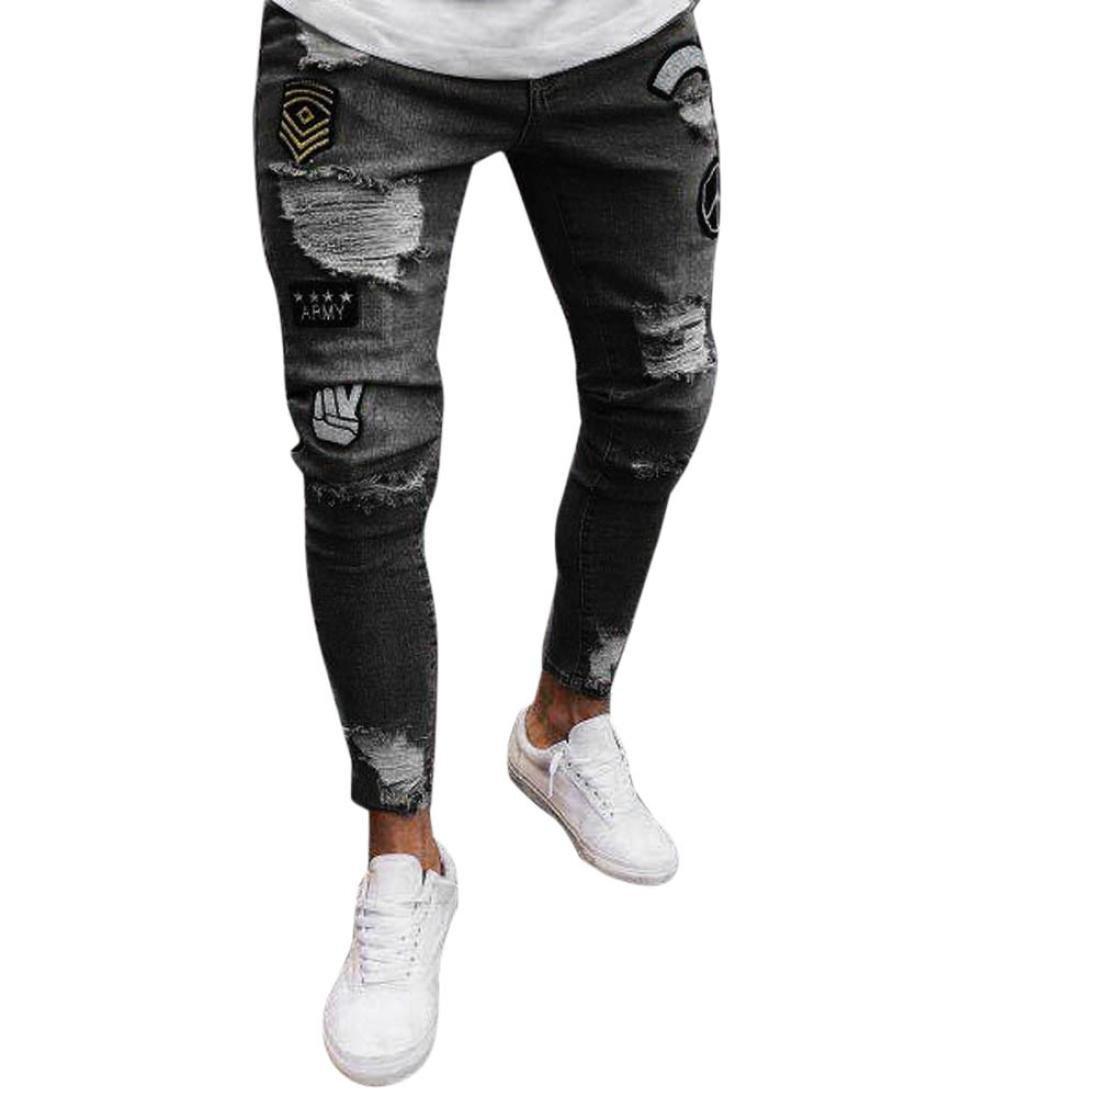 Realdo Men's Slim Hole Jeans, Casual Solid Denim Pants Skinny Frayed Trousers(Dark Grey,Medium)